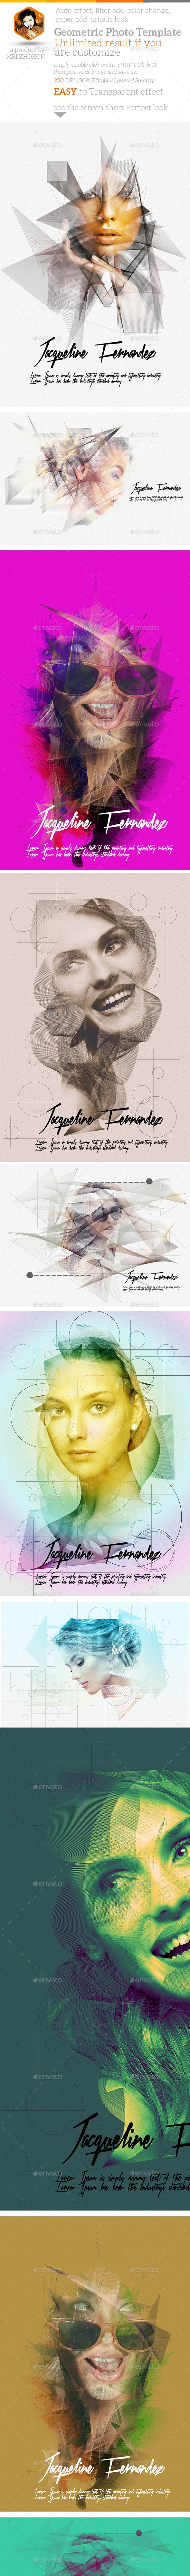 Geometric Photo Manipulation - Artistic Photo Templates